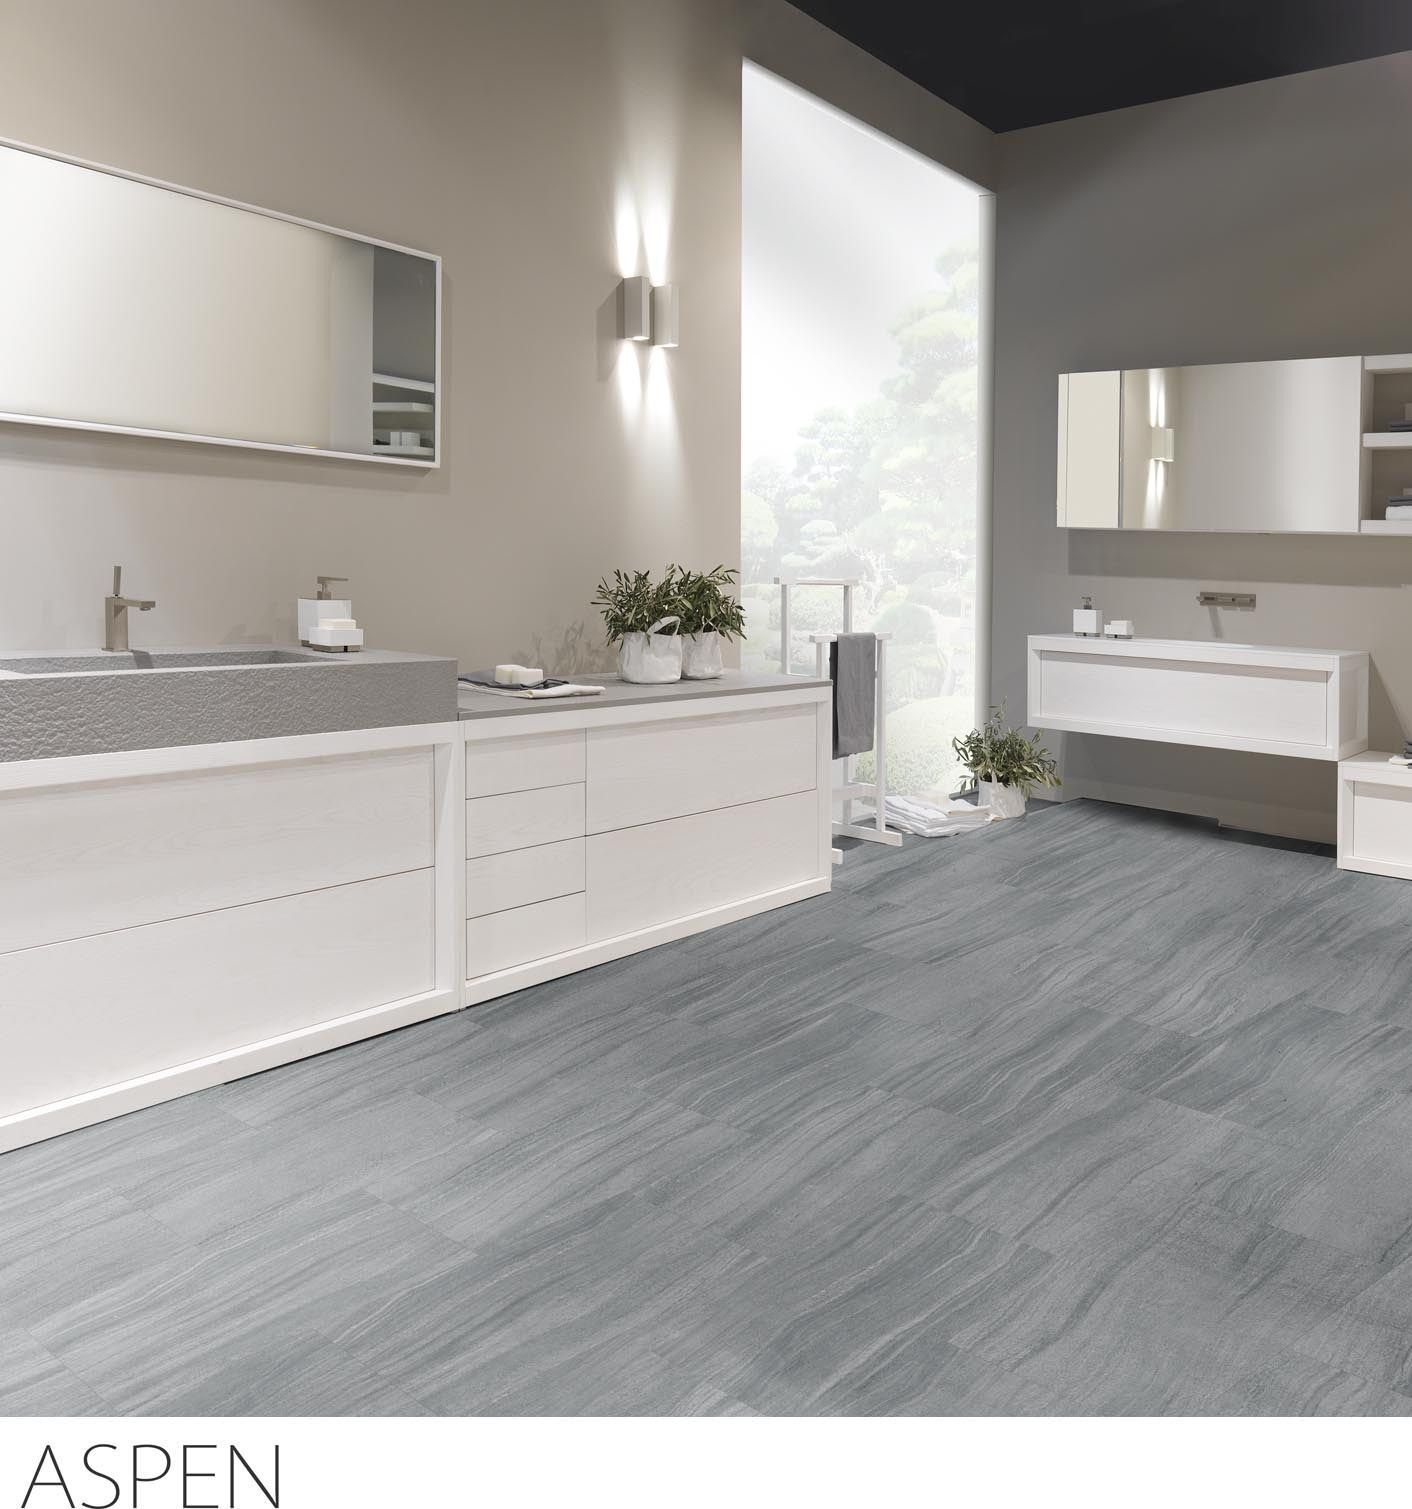 Dura Tiles Aspen Bathroom Floor Tile Bathroom Tile Design